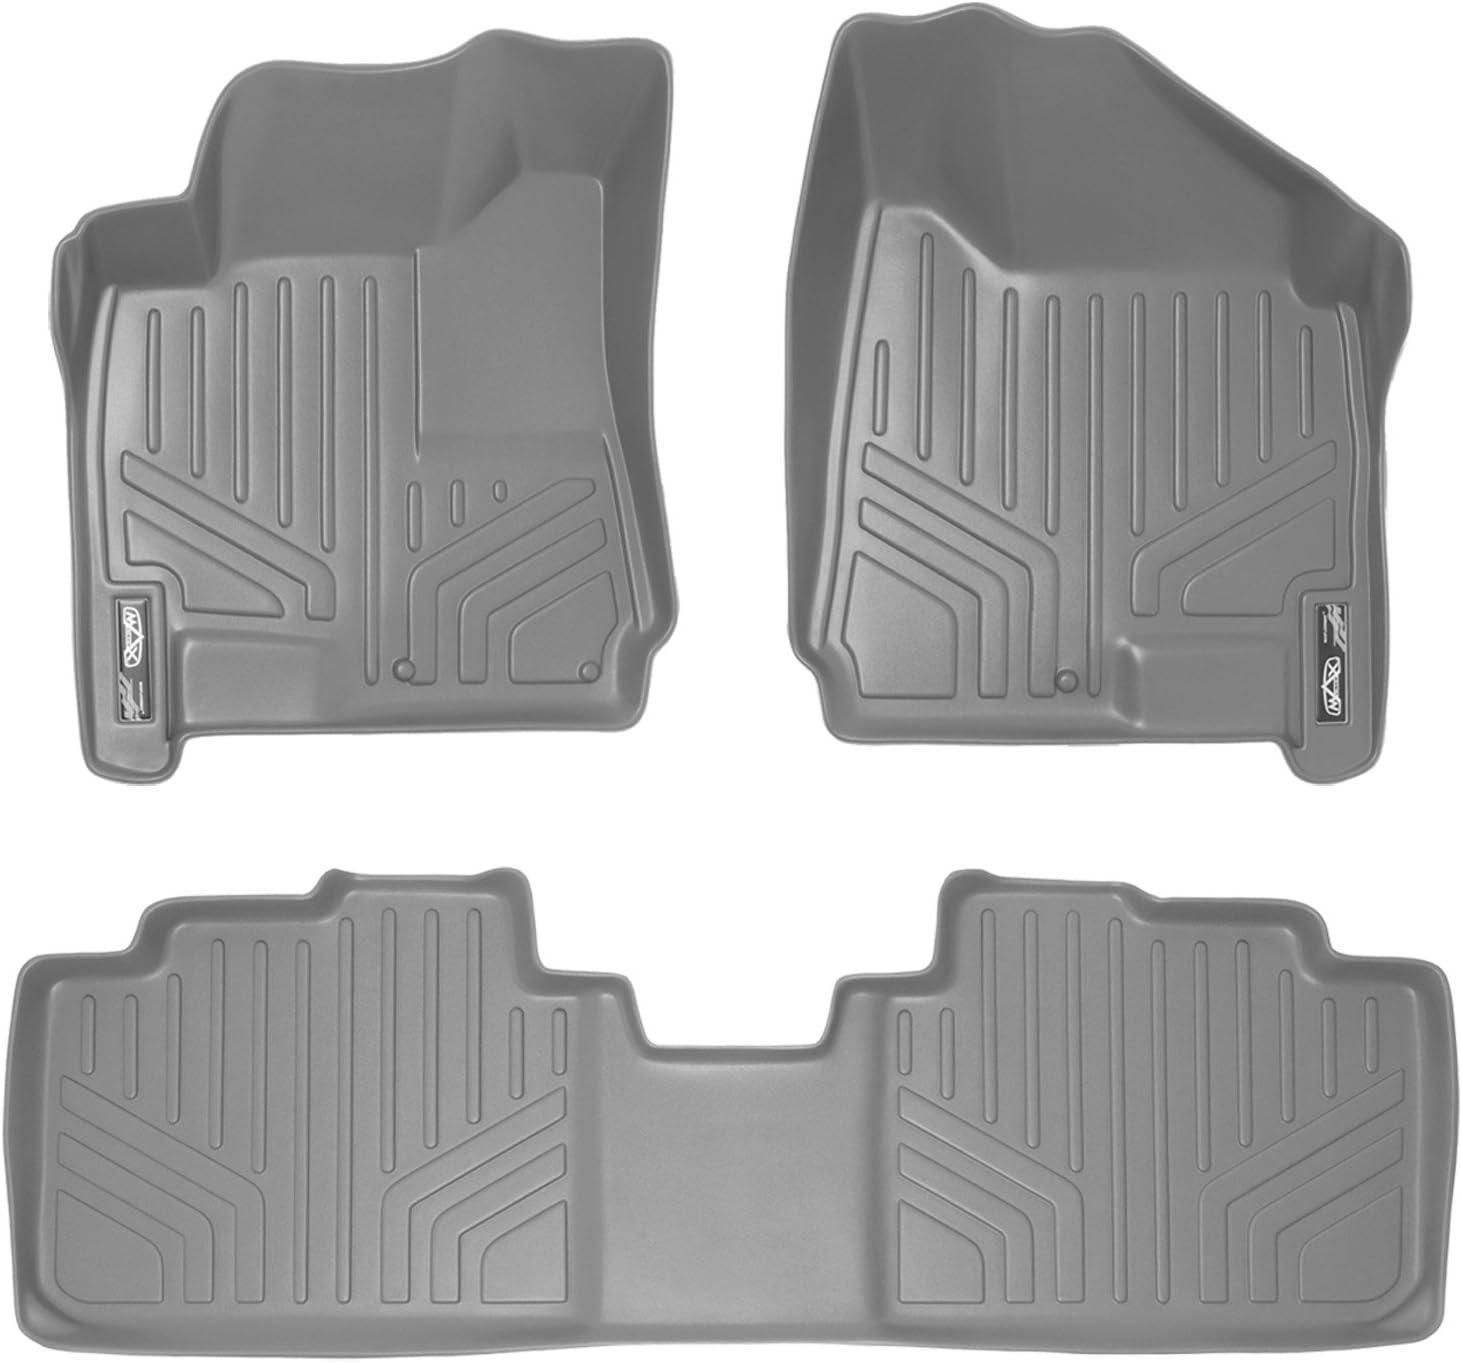 SMARTLINER Custom Fit Floor Mats 2 Row Liner Set Grey for 2010-2016 Cadillac SRX All Models